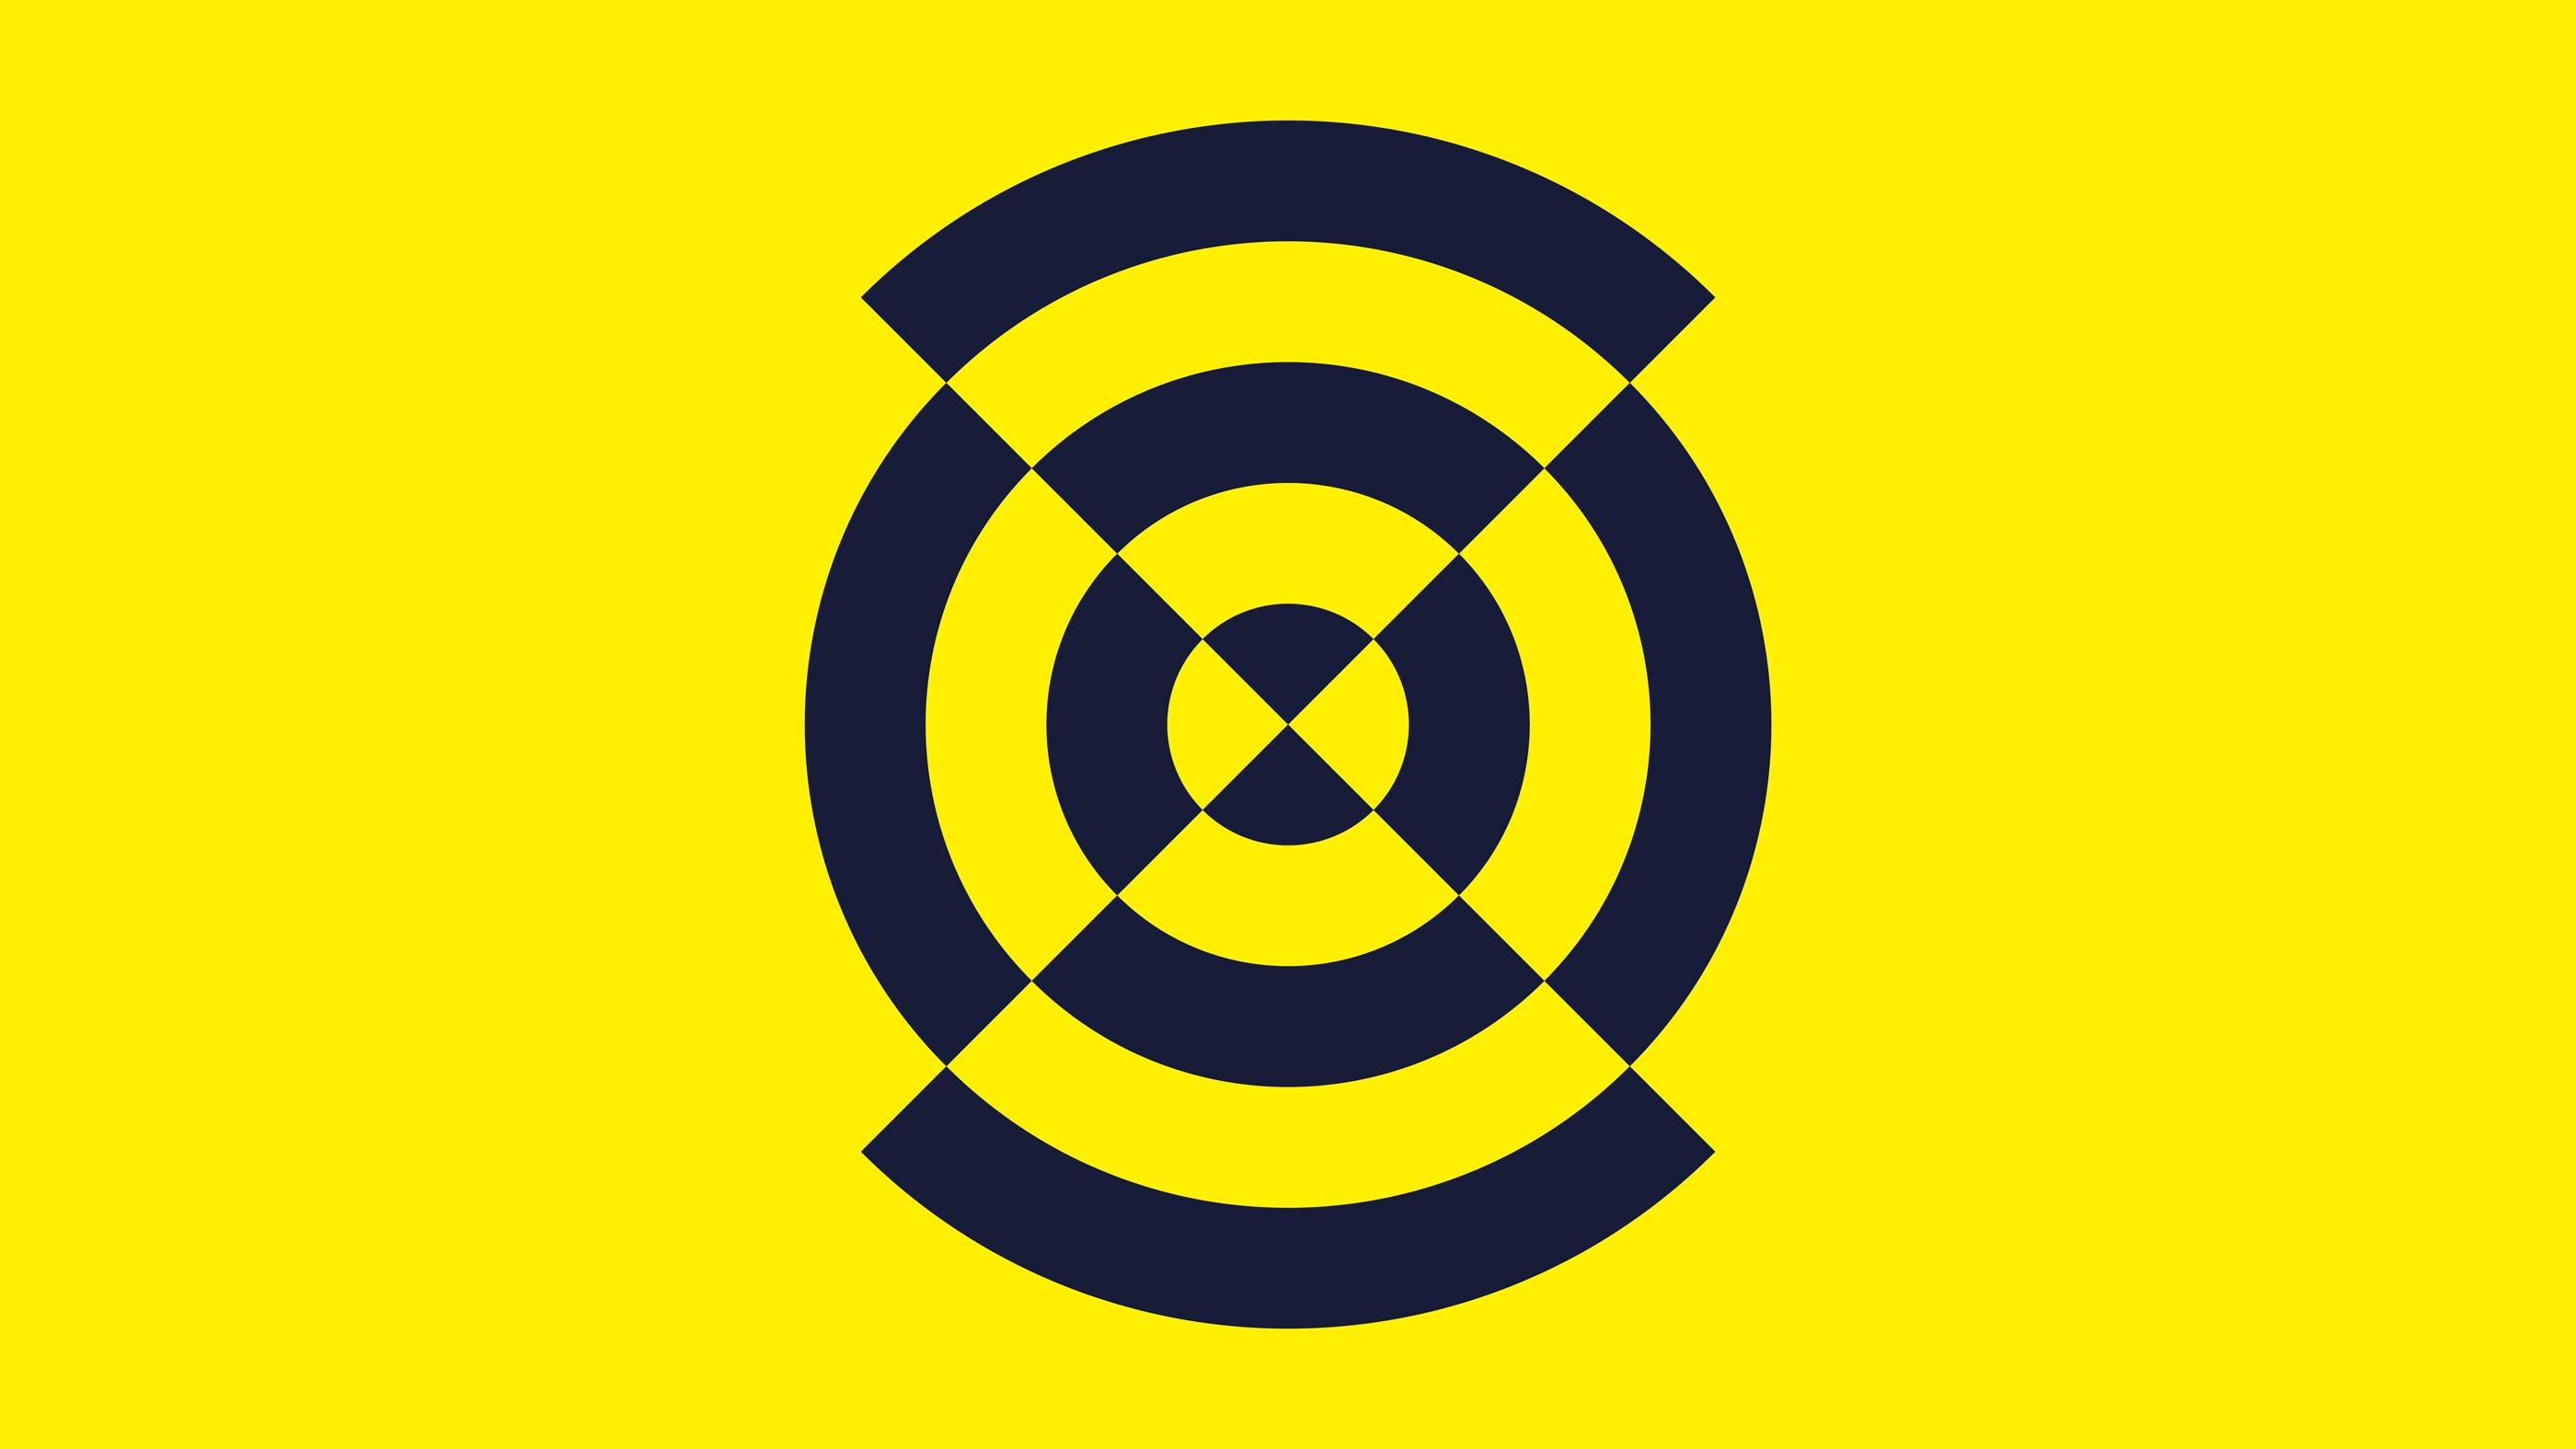 Subliners, Mother Design, Visual Identity, Logo, Yaya Xu, Matt van Leeuwen, Matthijs van Leeuwen, Andbox, Call of Duty